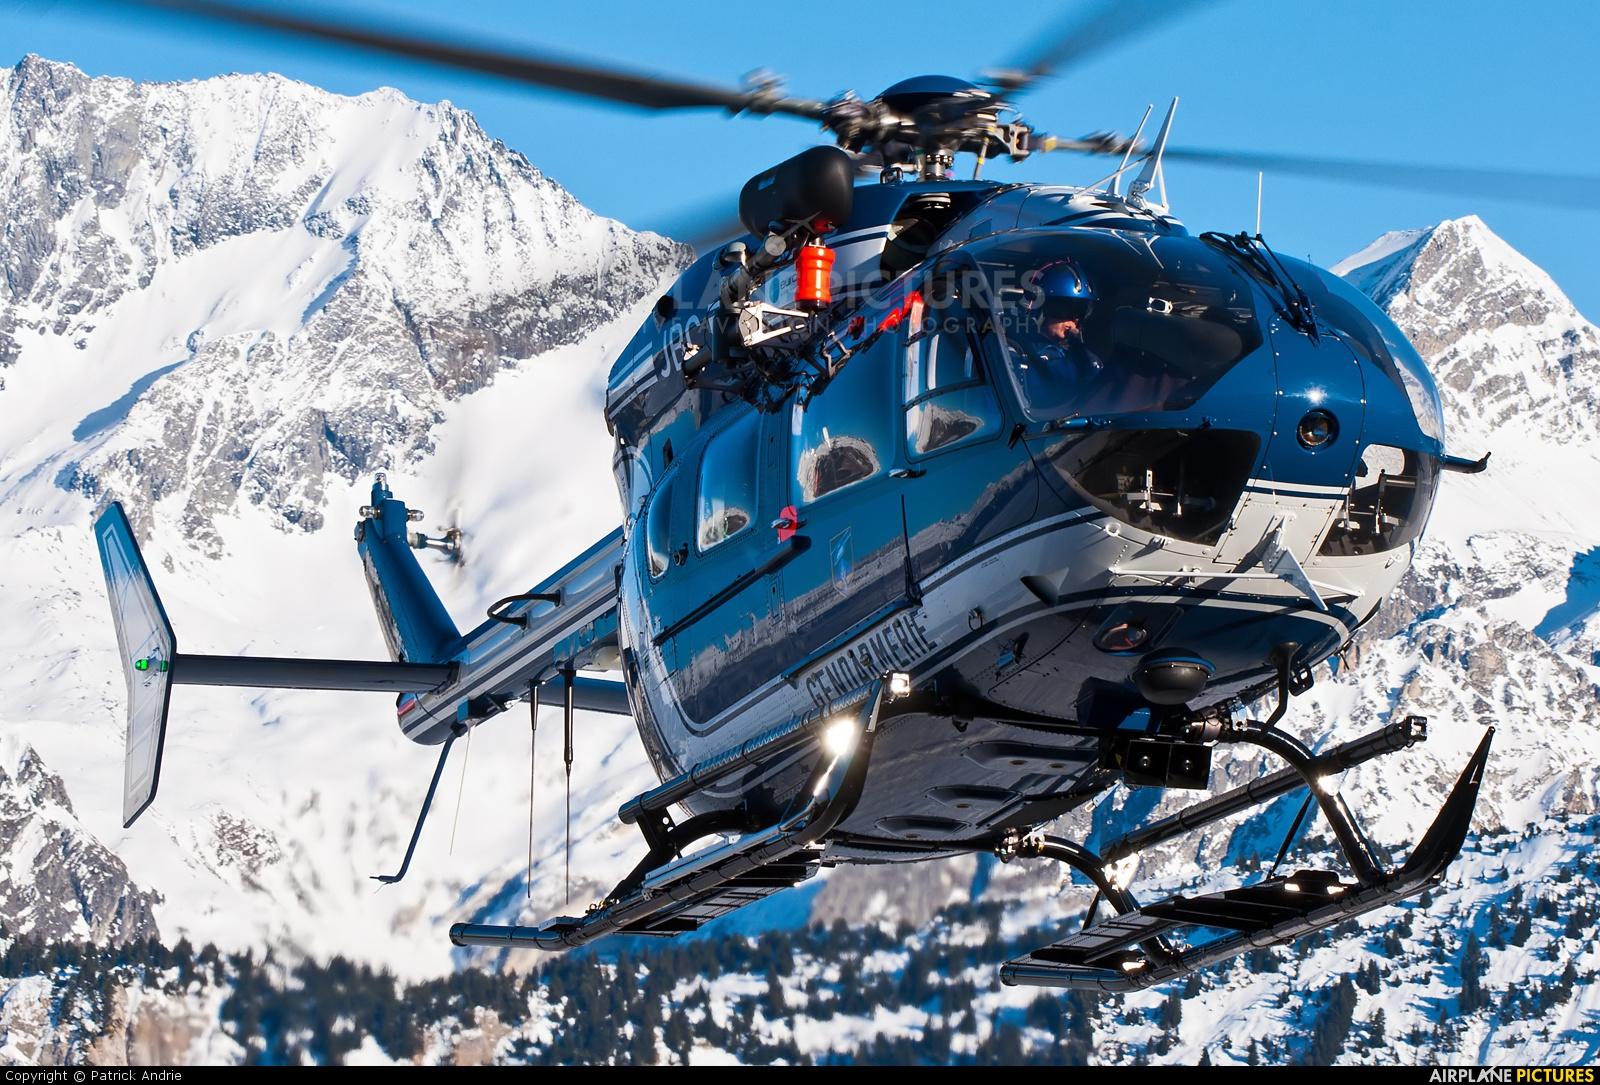 France - Gendarmerie F-MJBC aircraft at Courchevel